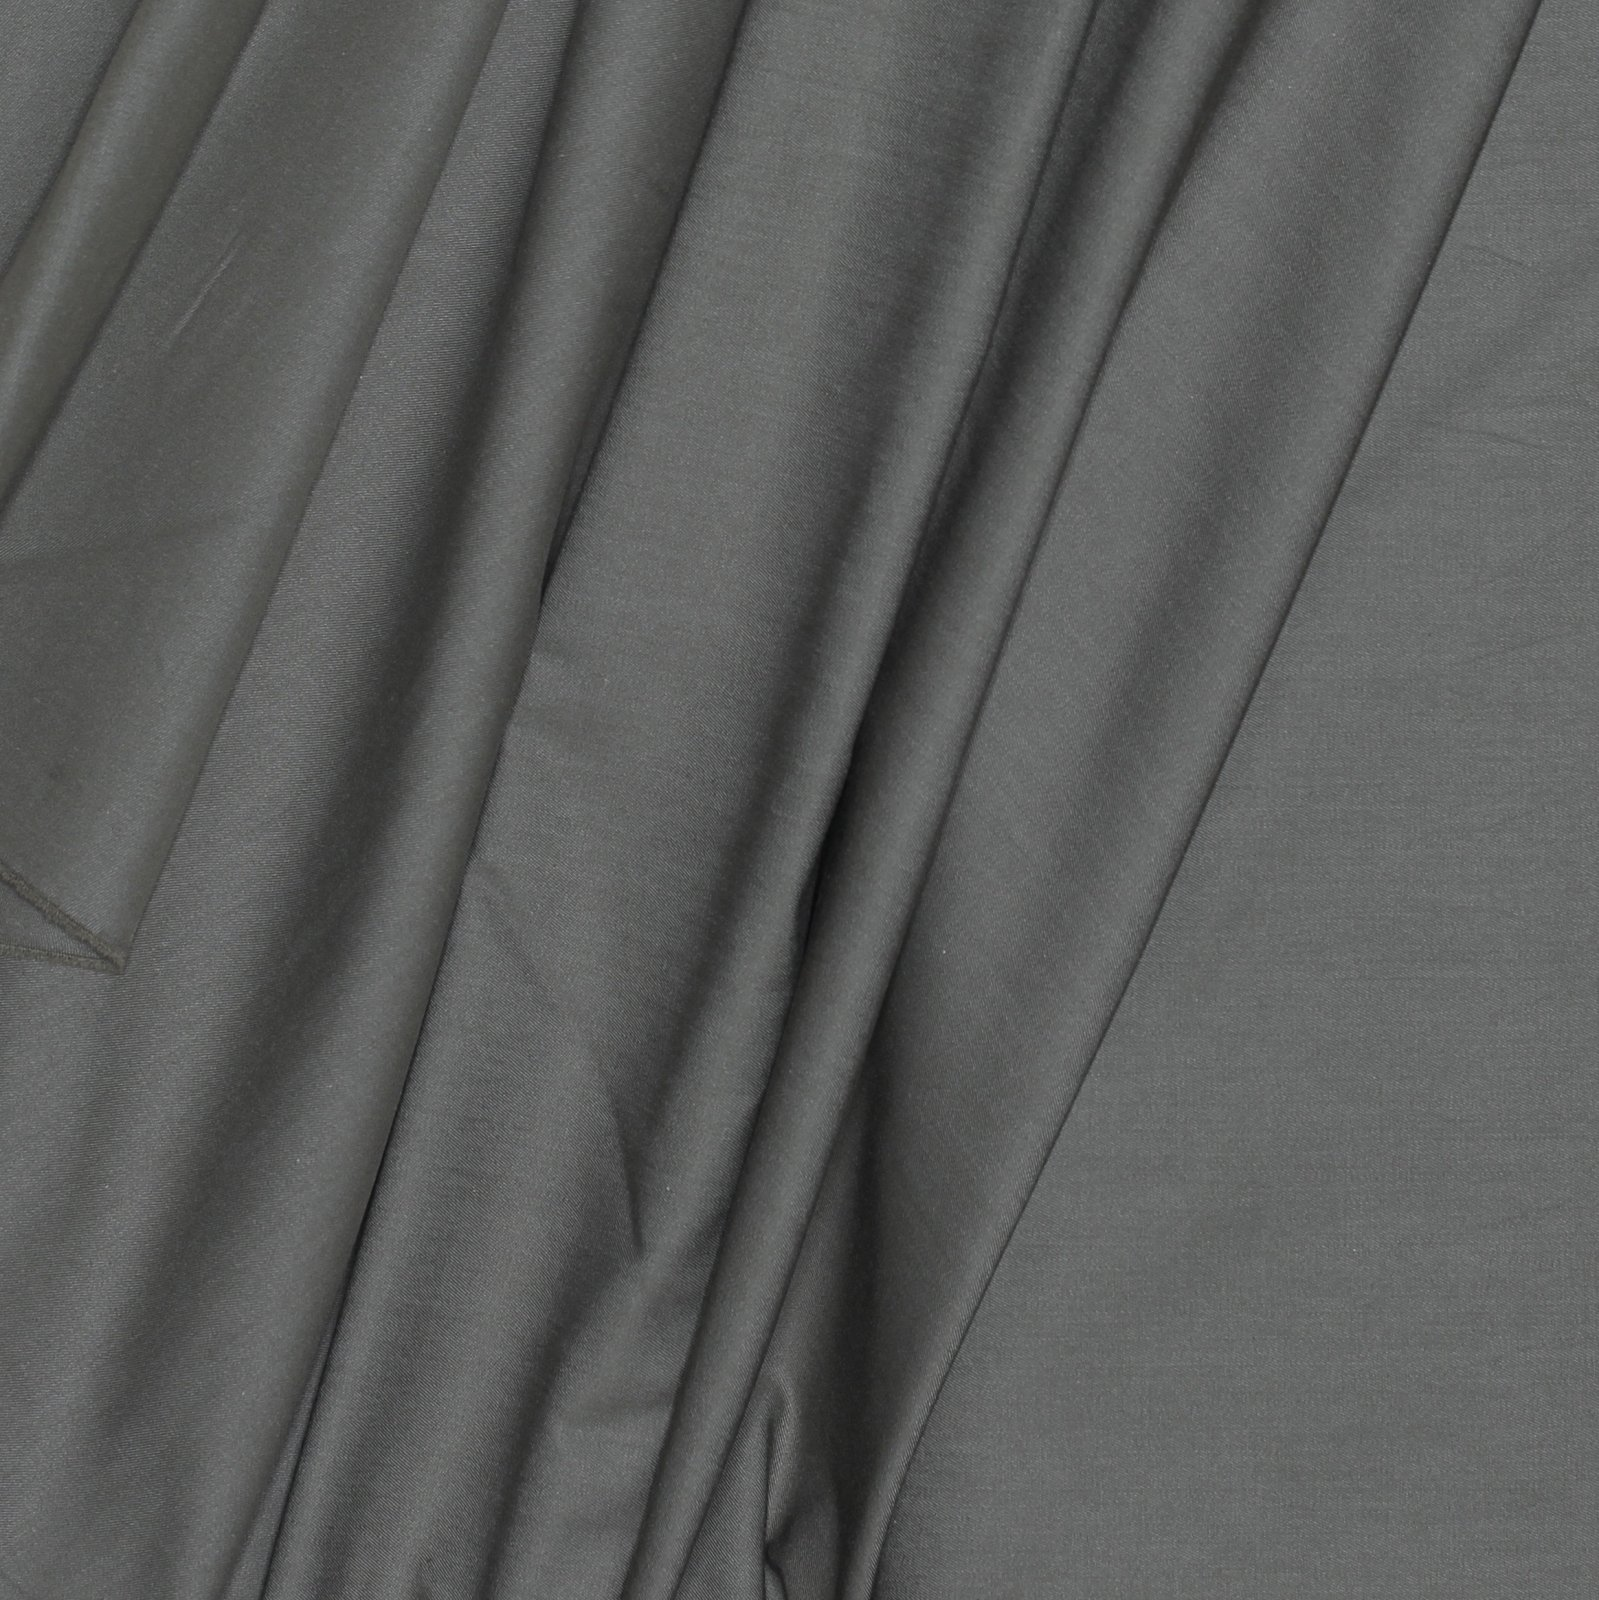 Khaki Water Repellent Italian Cotton